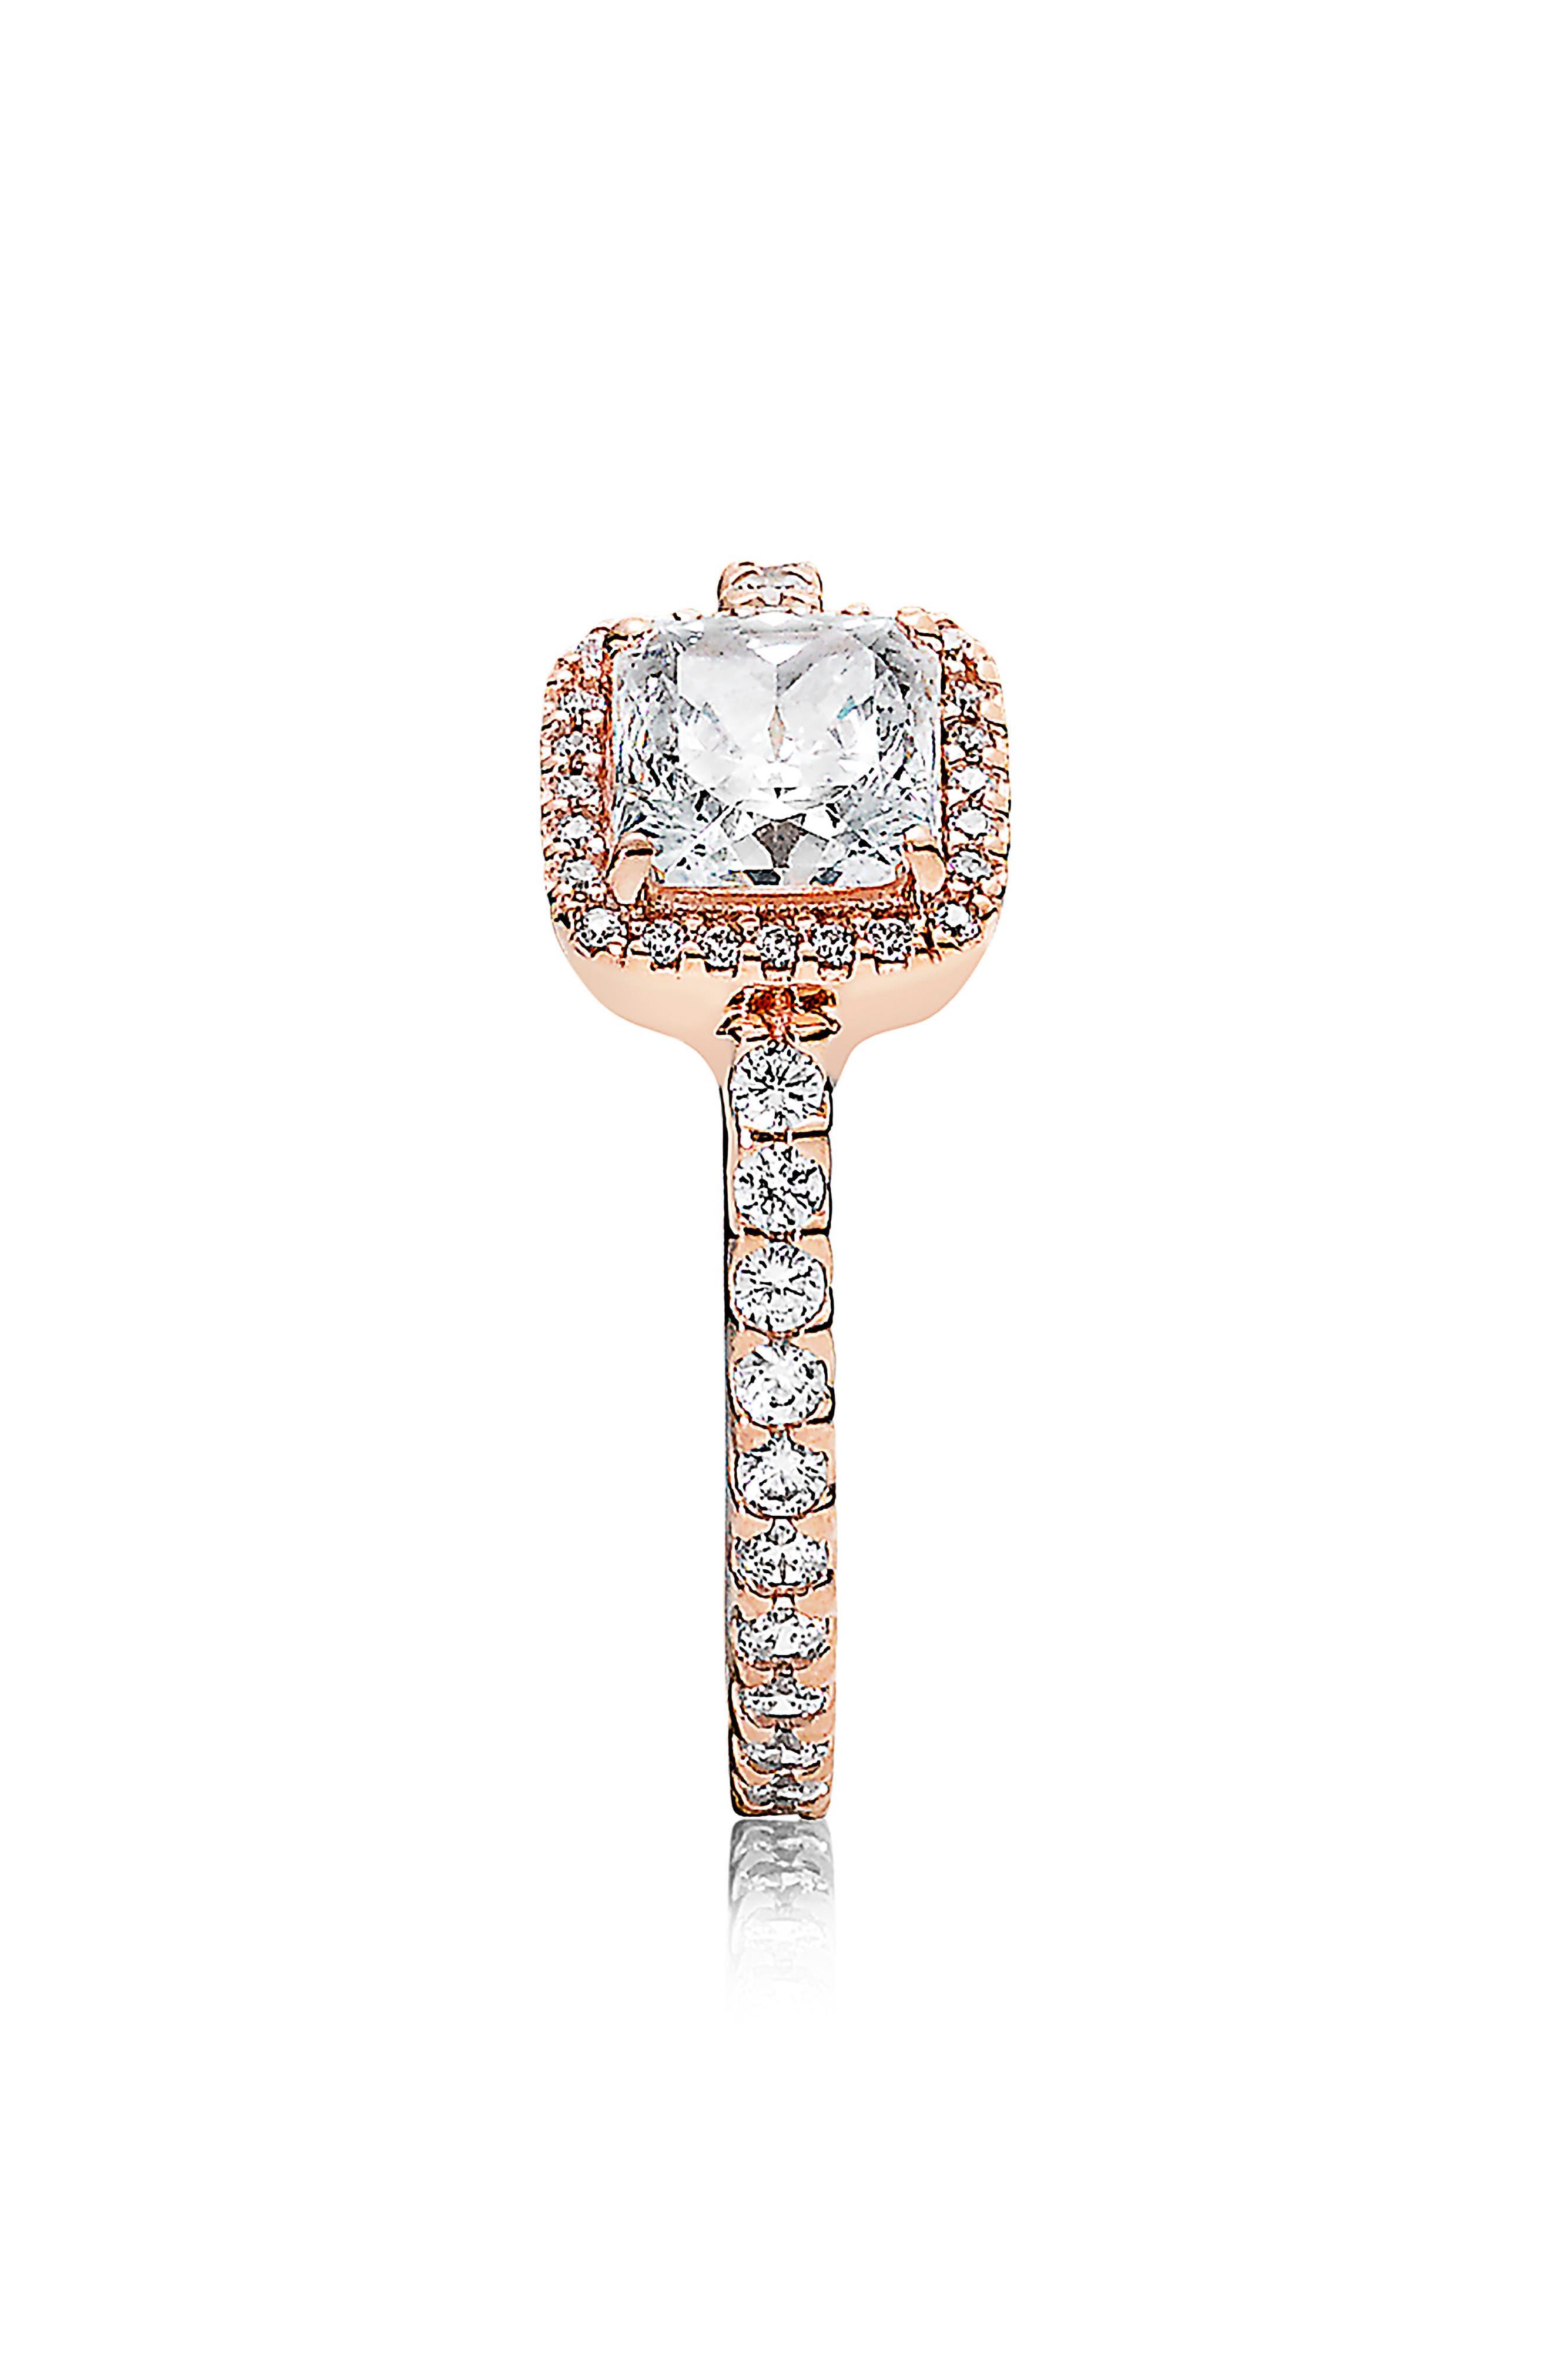 PANDORA, Timeless Elegance Ring, Alternate thumbnail 2, color, ROSE GOLD